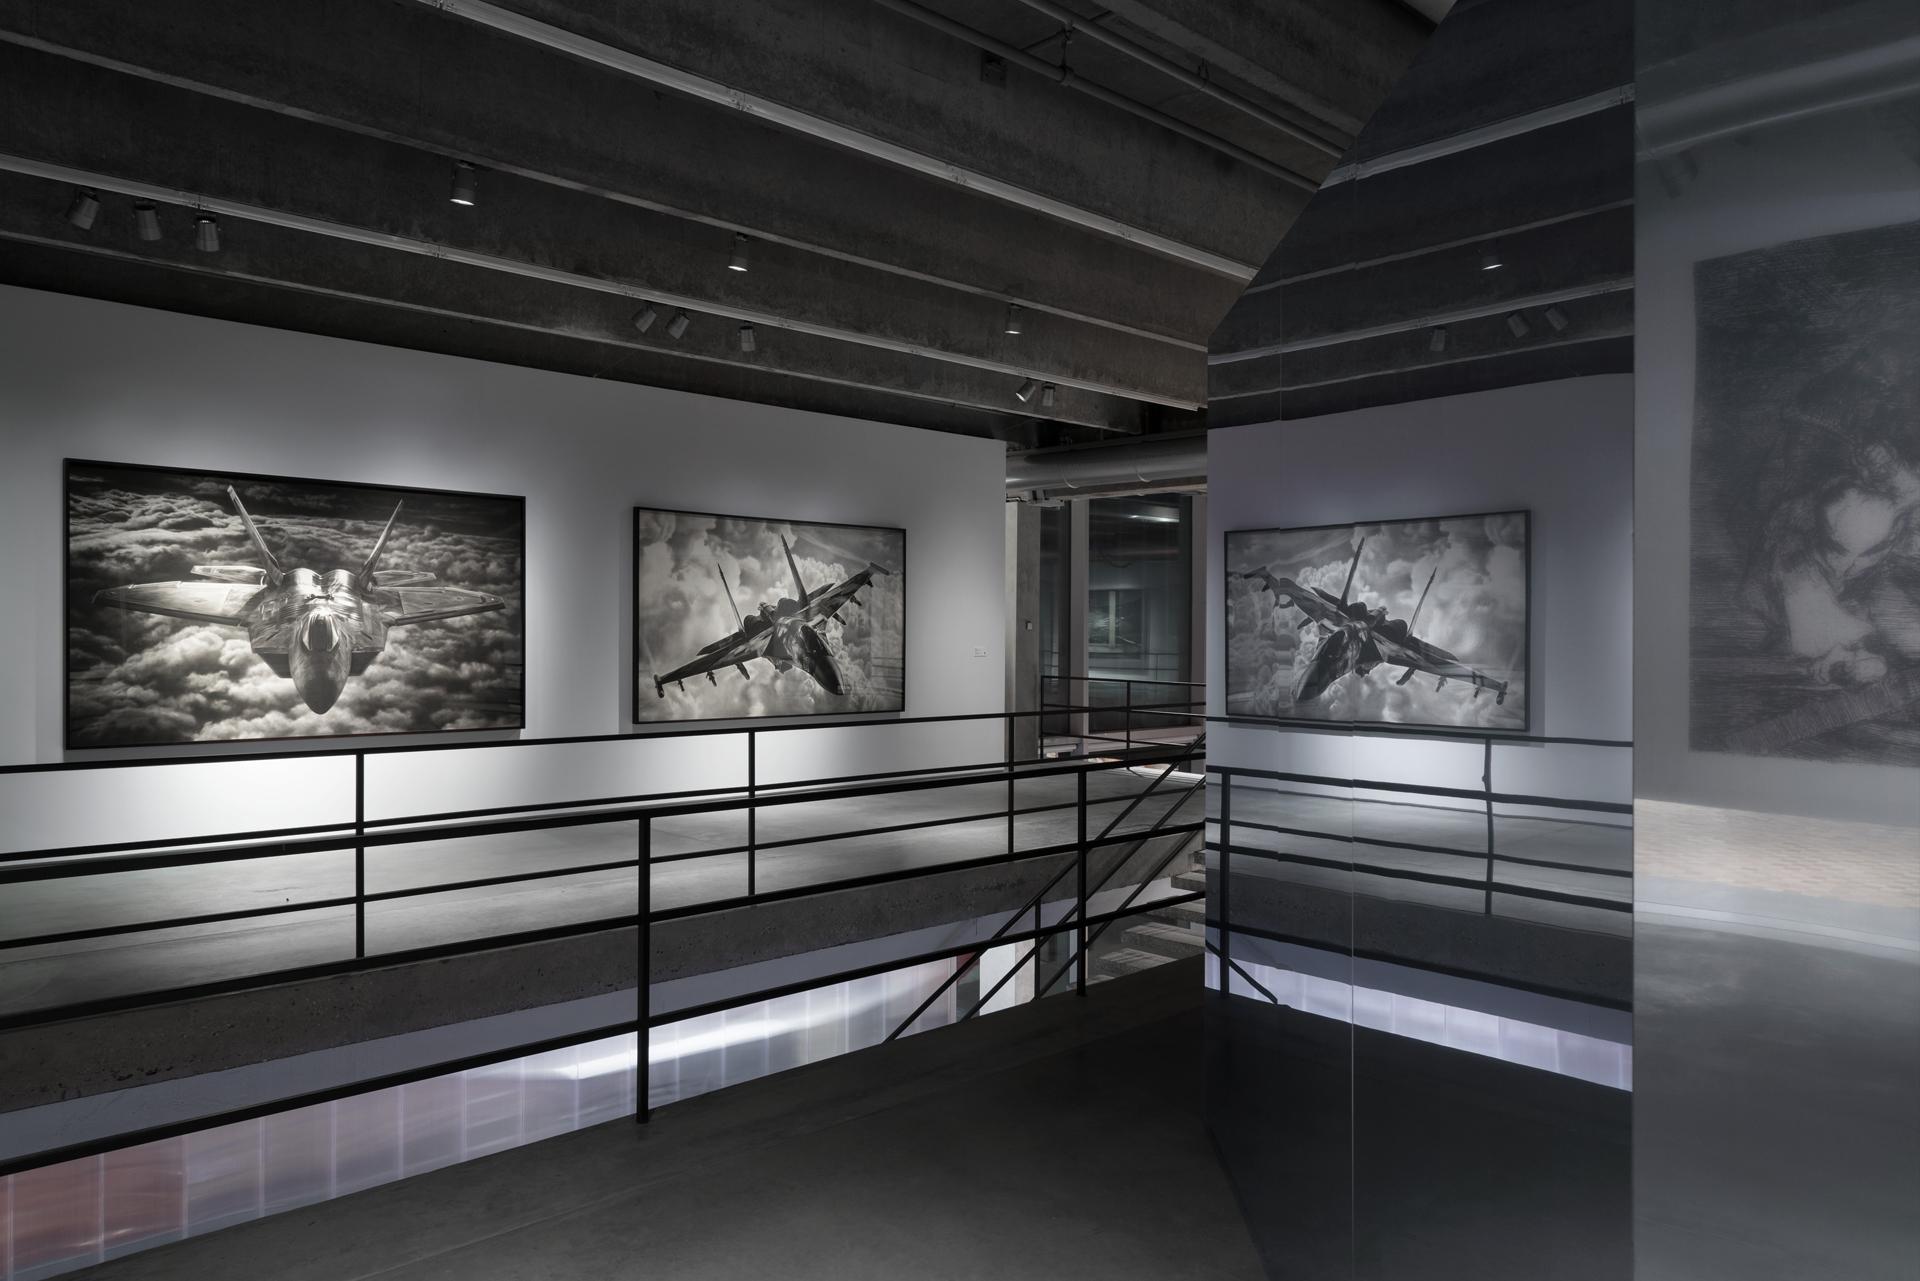 PJC-Light-Studio-Garage-Museum-of-Contemporary-Art-Moscow-Robert-Longo-04W.jpg